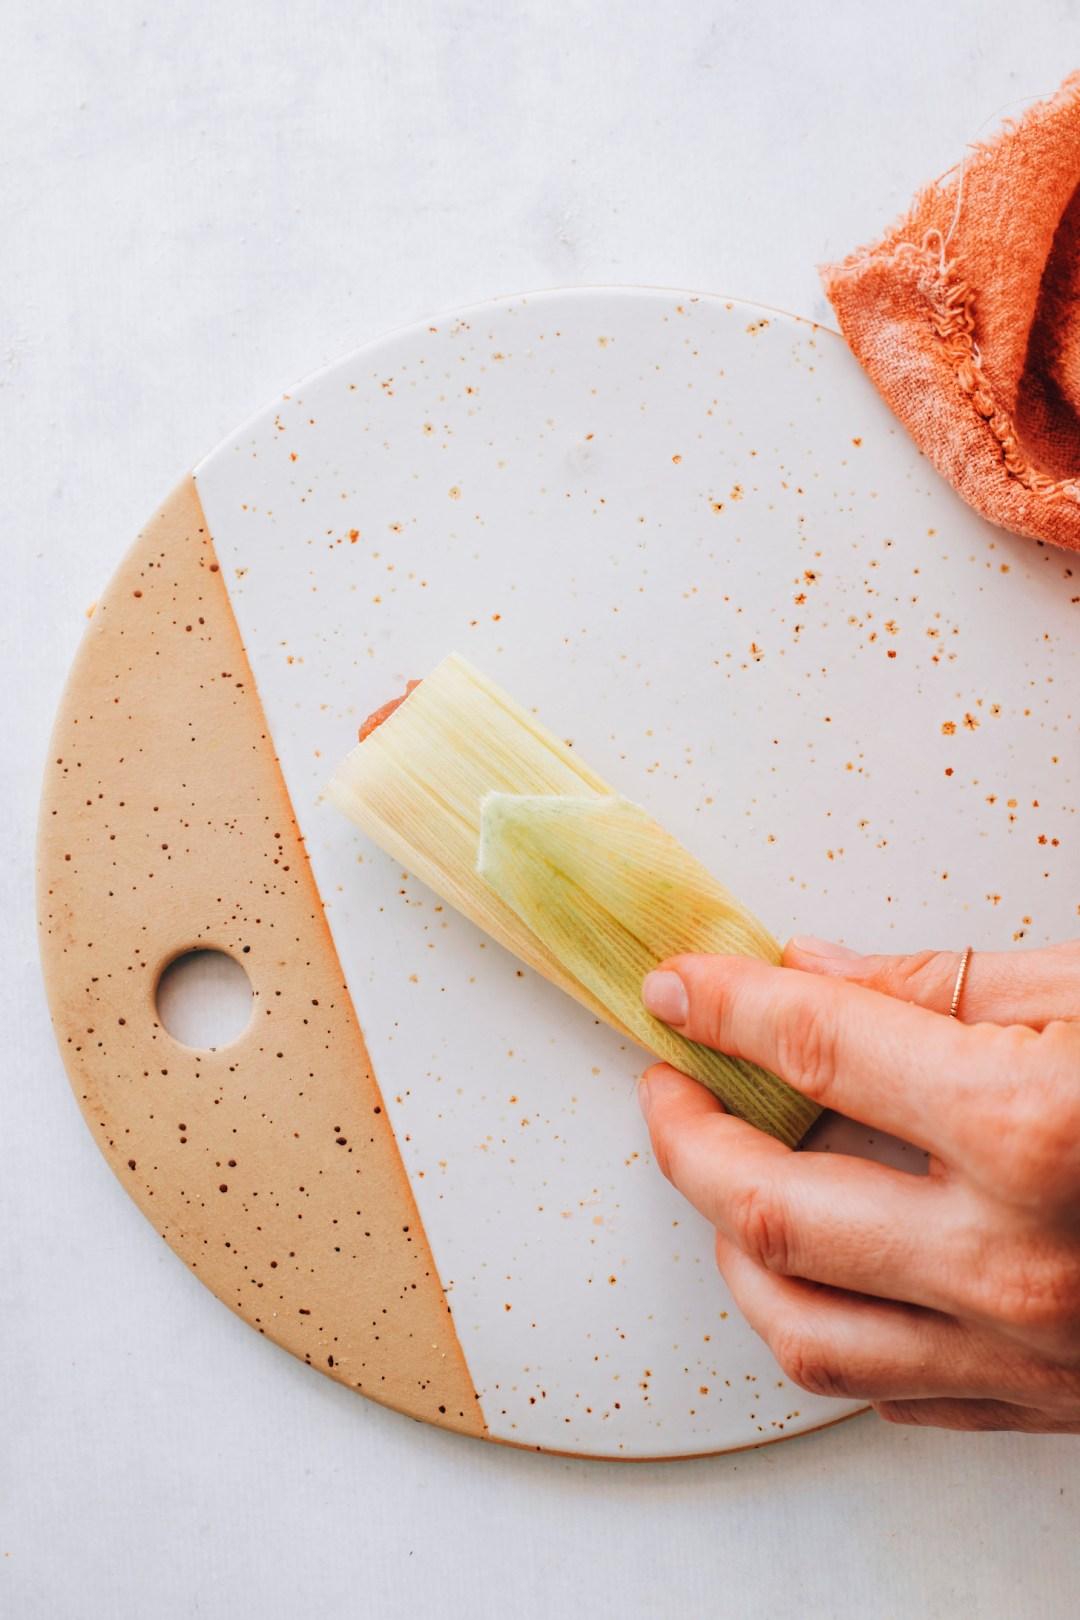 Showing a folded corn husk